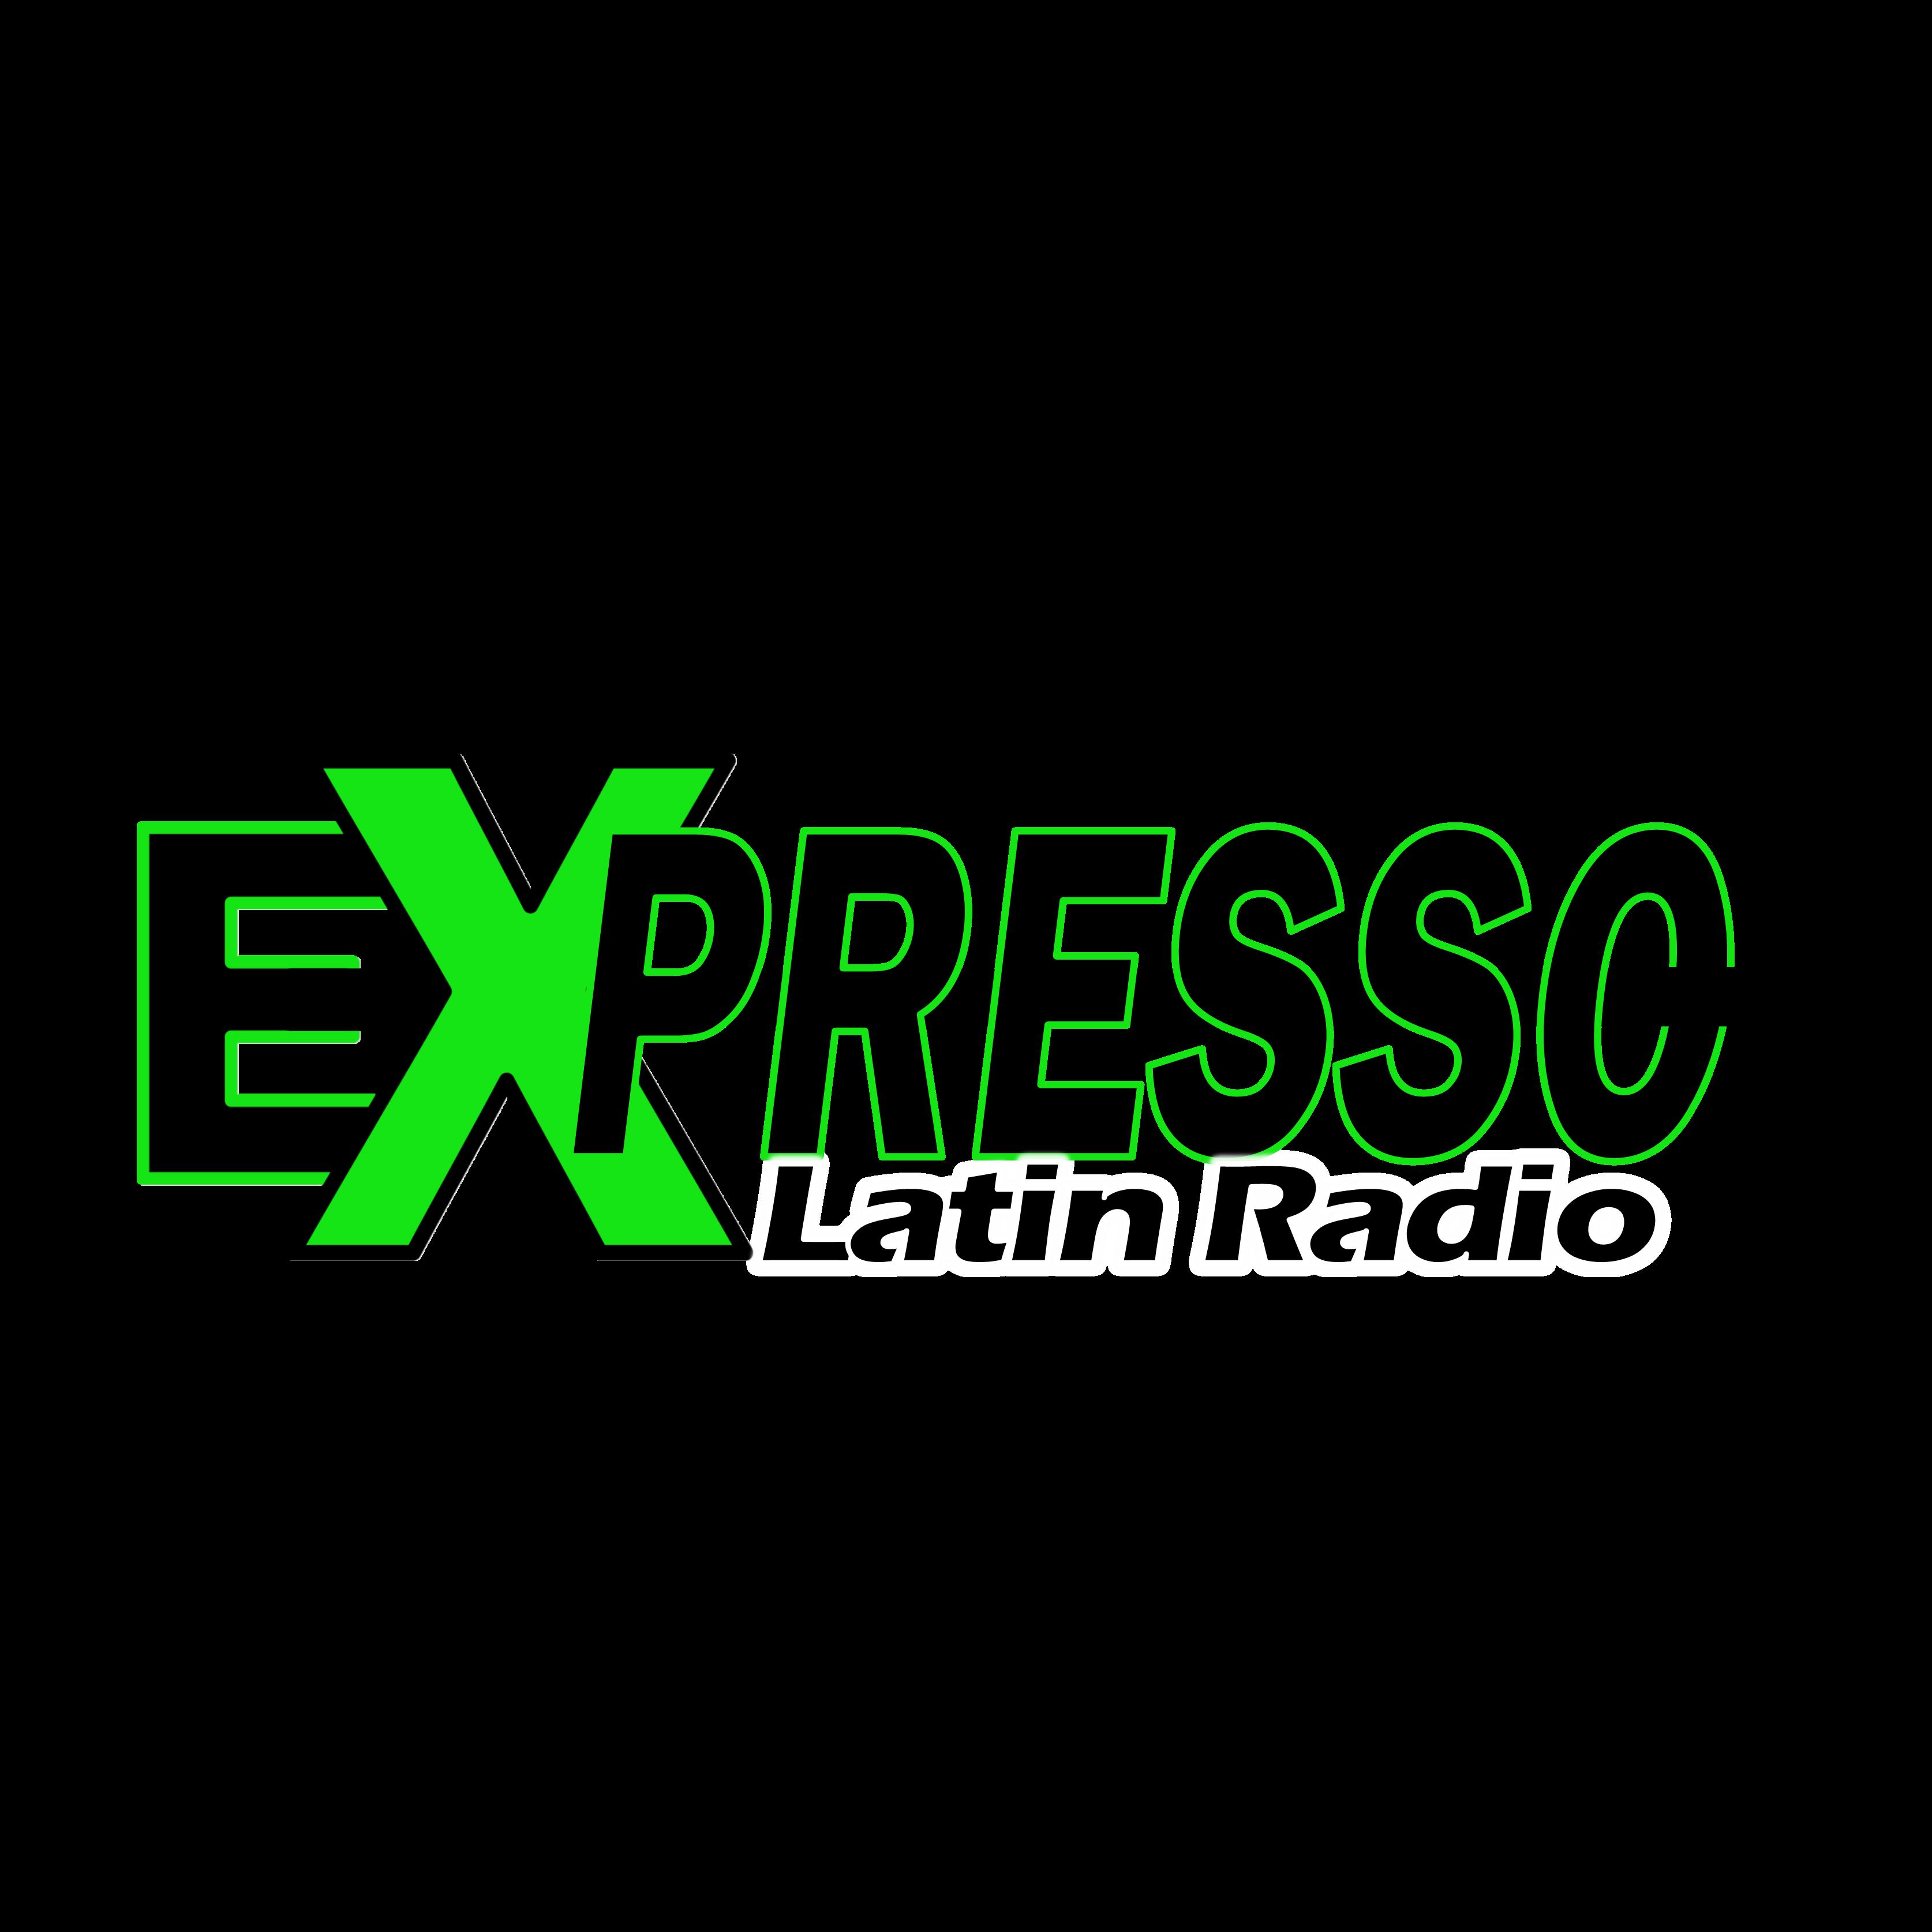 Expresso1600 LatinRadio